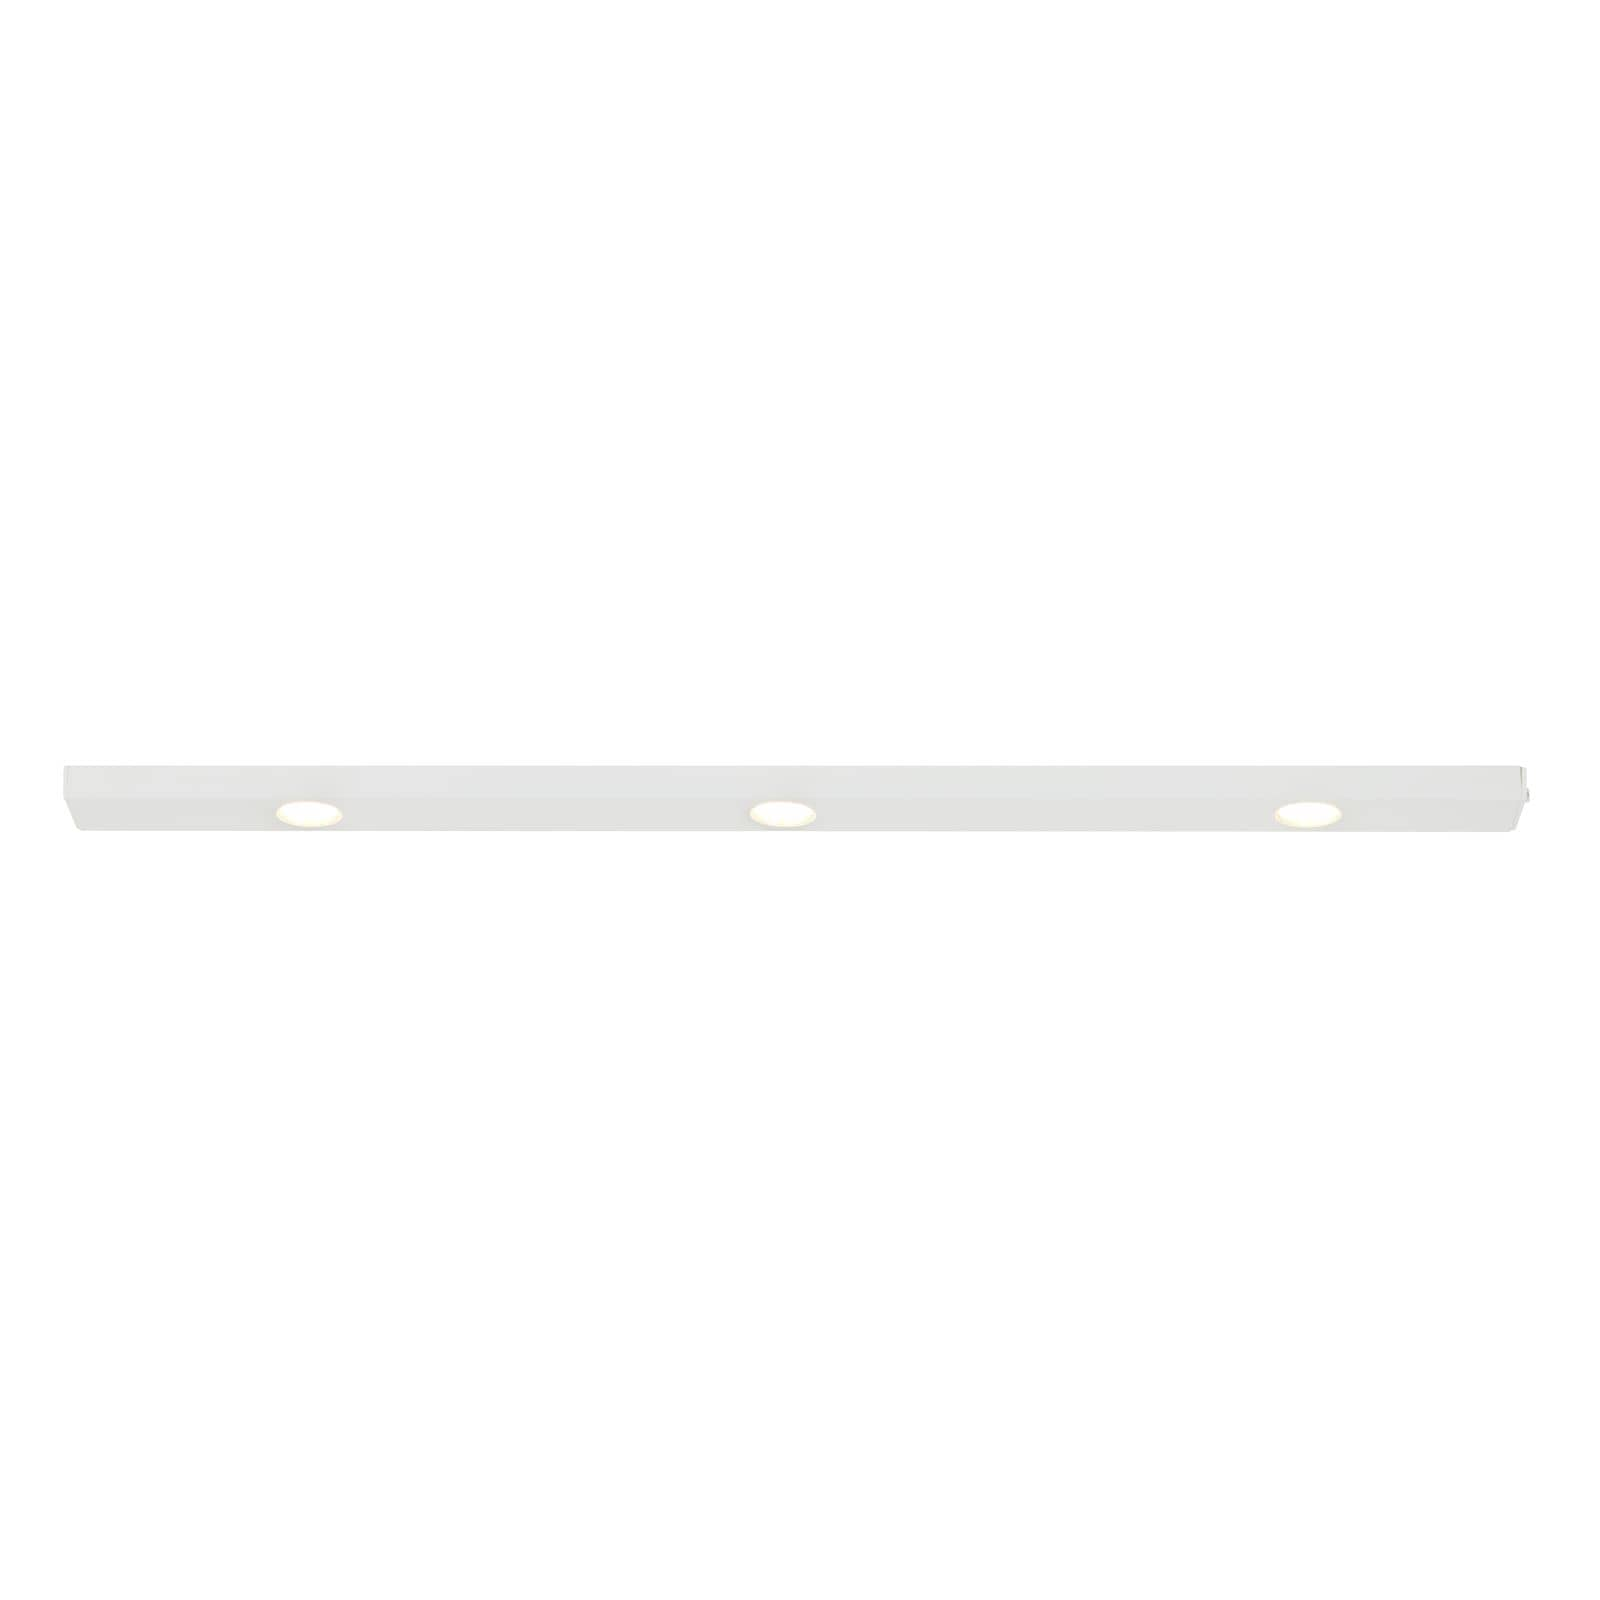 nordlux 15566101 cabinet led unterbauleuchte 9w unterschrank leuchte. Black Bedroom Furniture Sets. Home Design Ideas